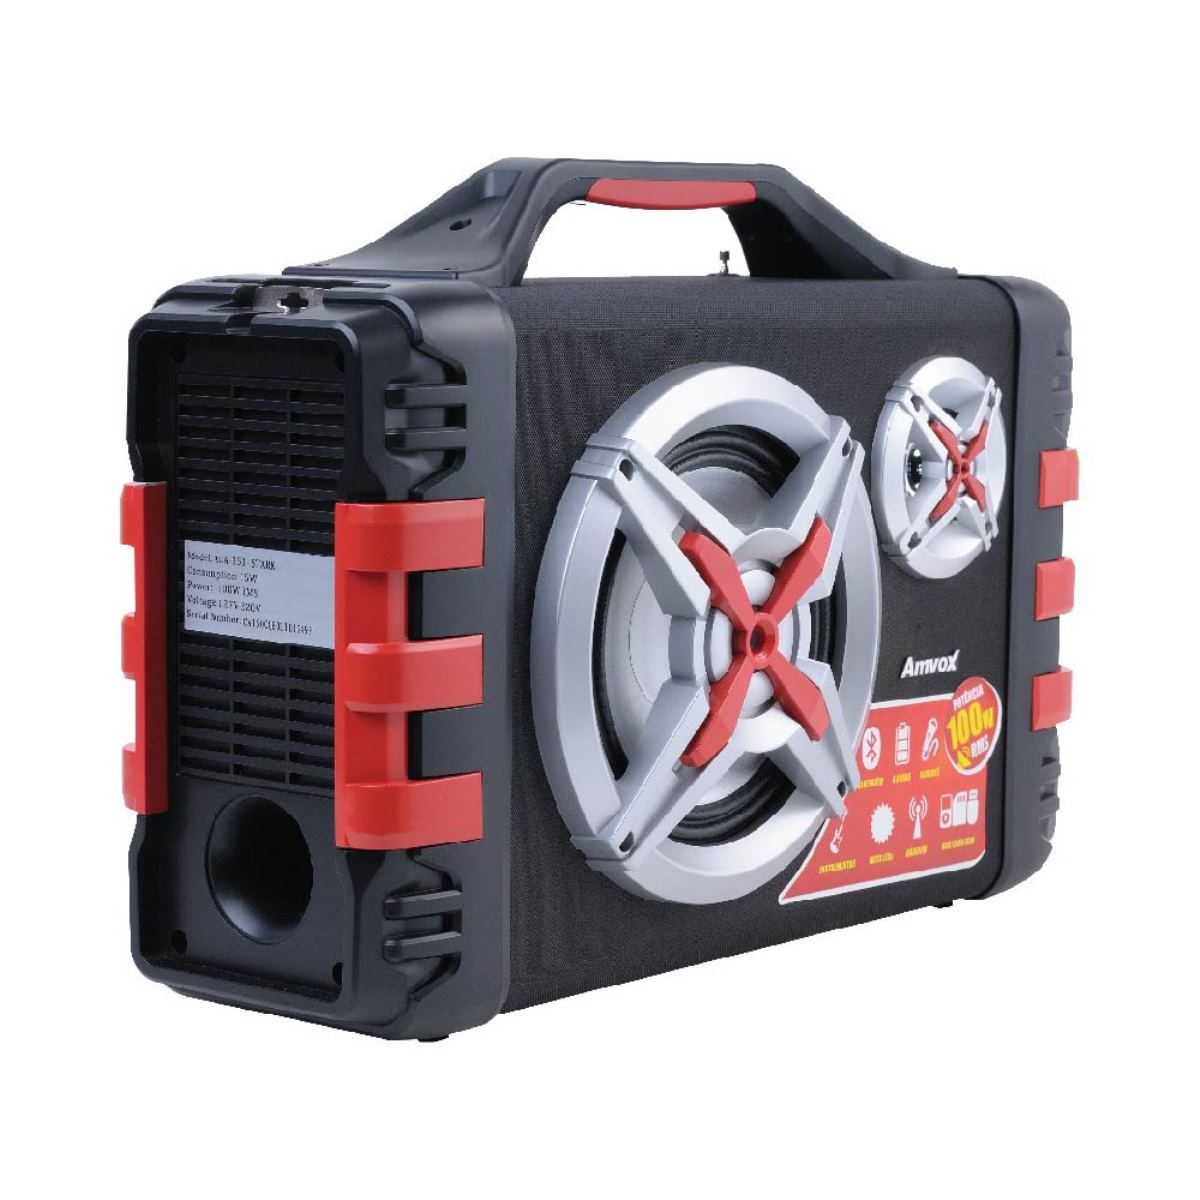 Caixa Bluetooth Amplificada Amvox Aca-150 100w Radio Mp3 P10